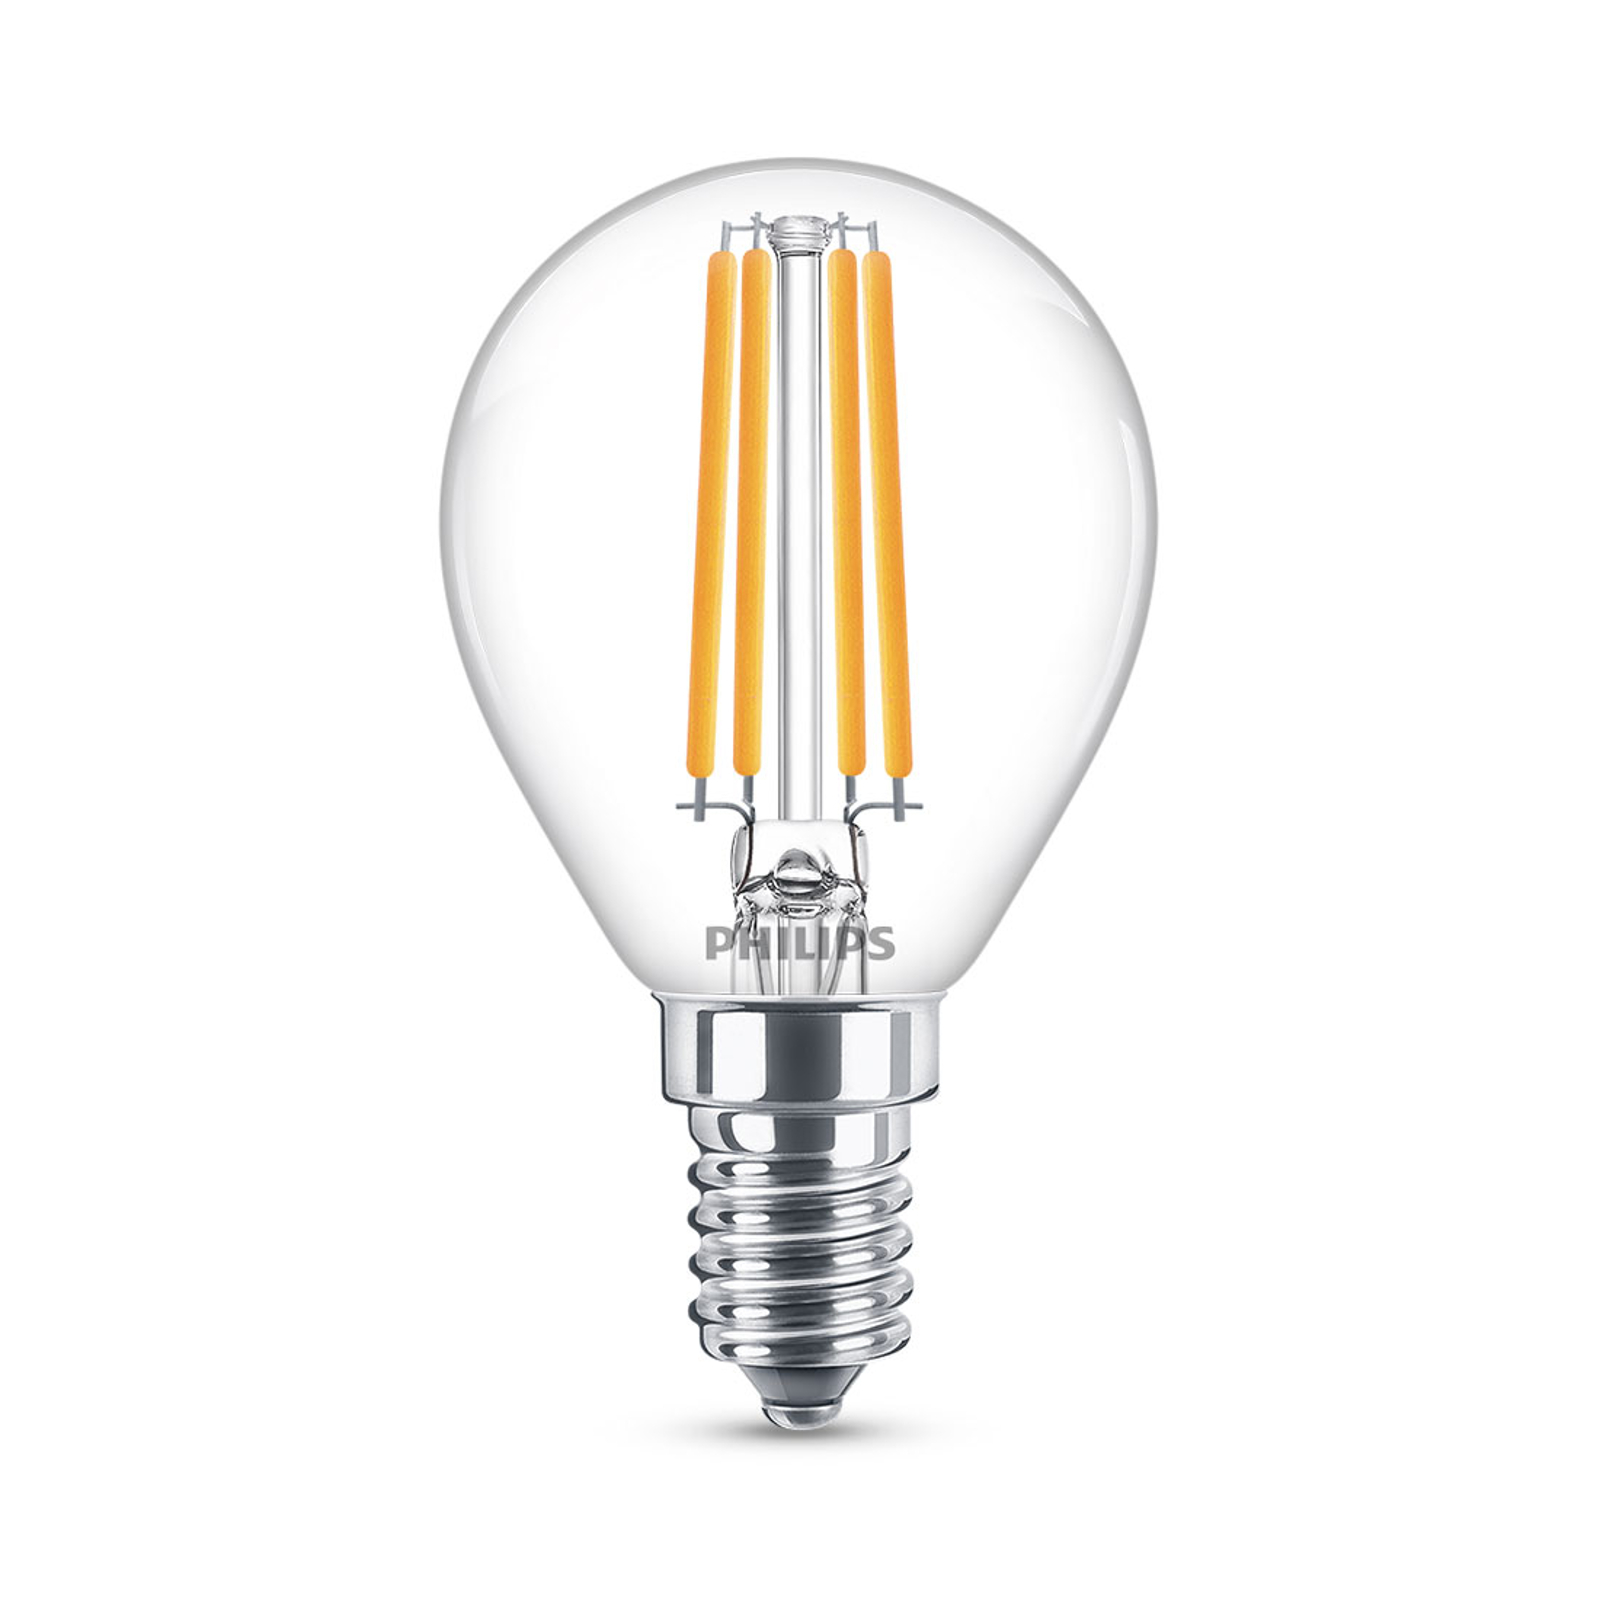 Philips Classic żarówka LED E14 P45 6,5W 2700K